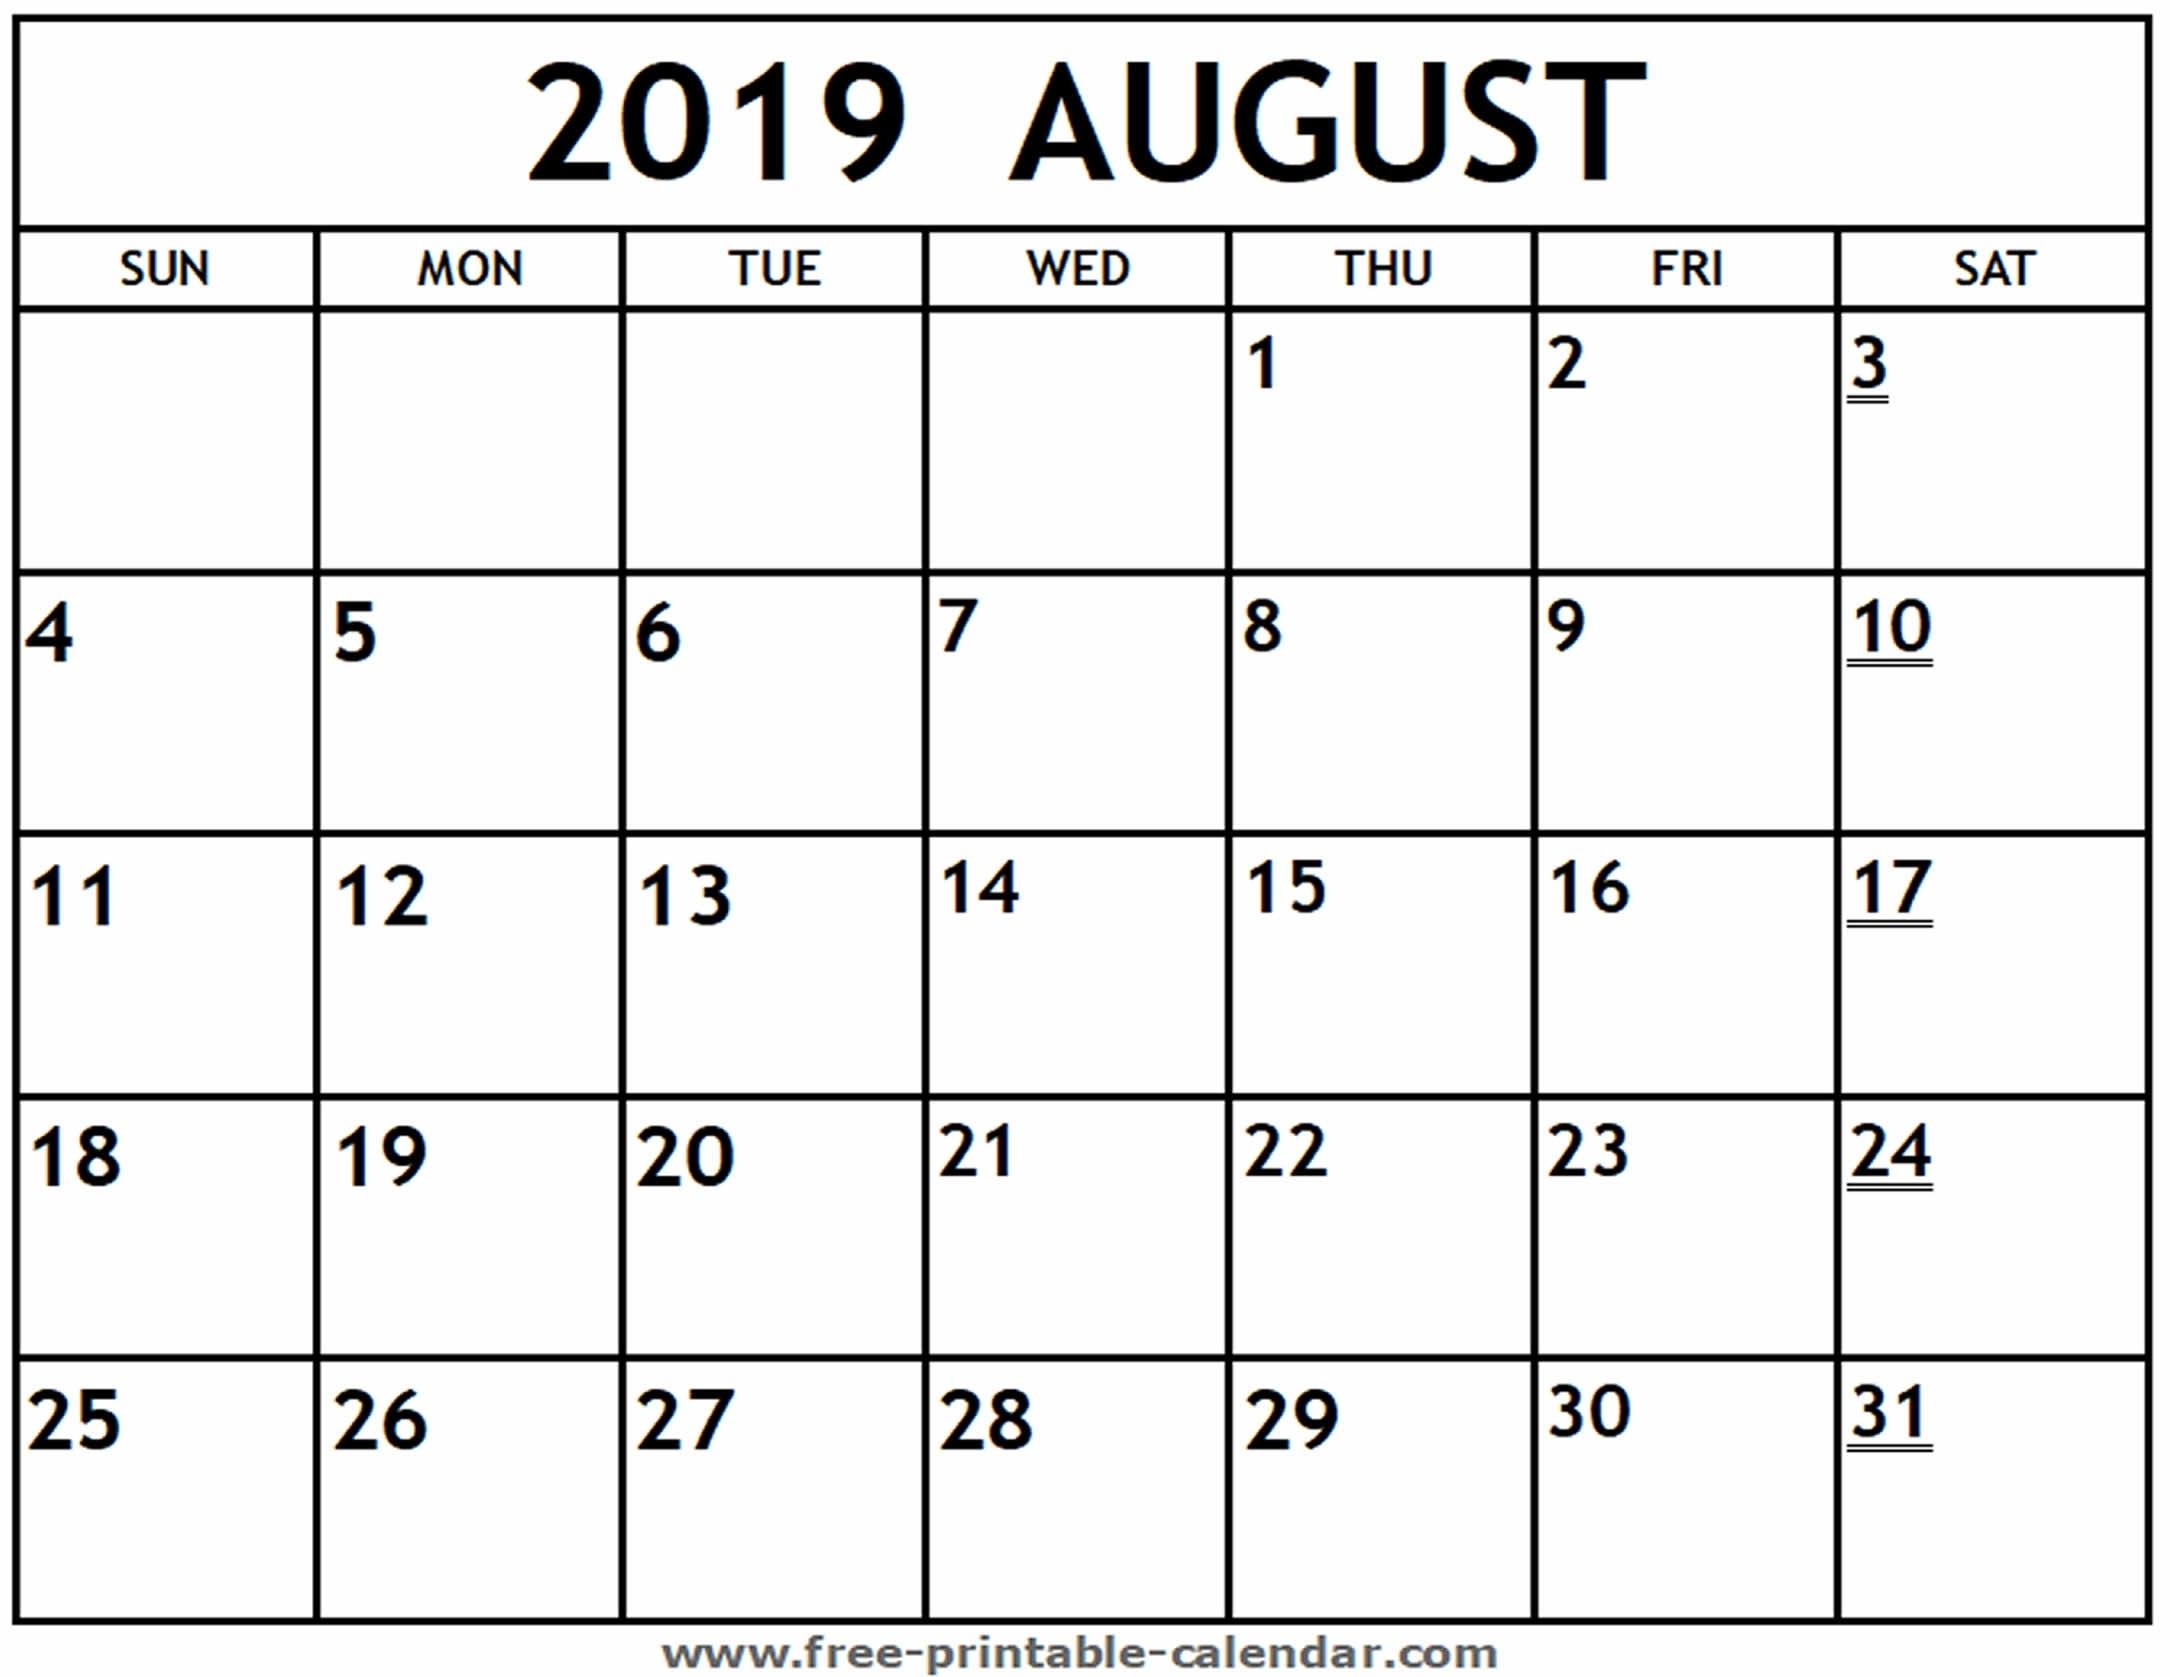 Printable 2019 August Calendar - Free-Printable-Calendar regarding Picture Of August On Calendar